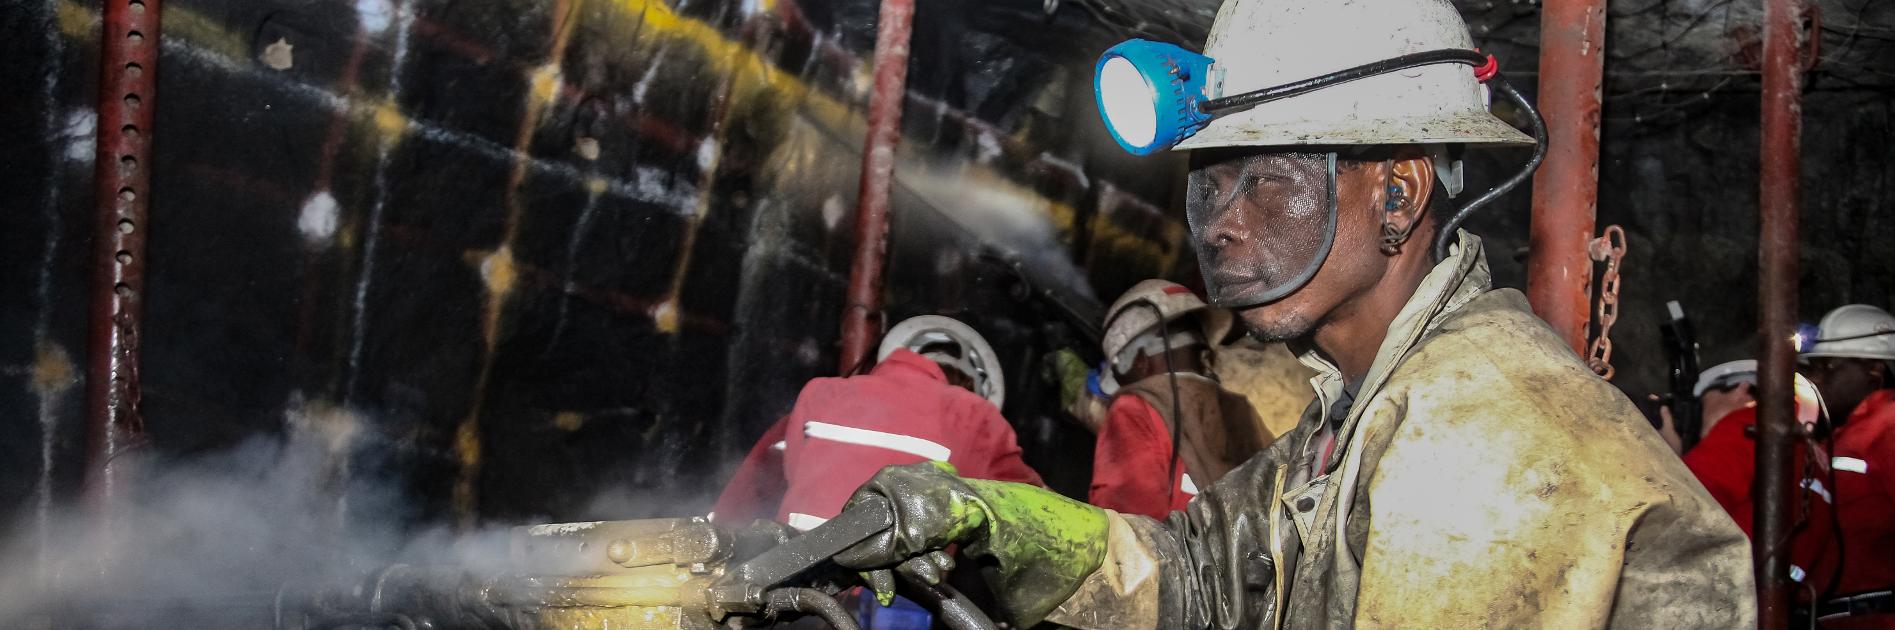 Mining worker holding equipment